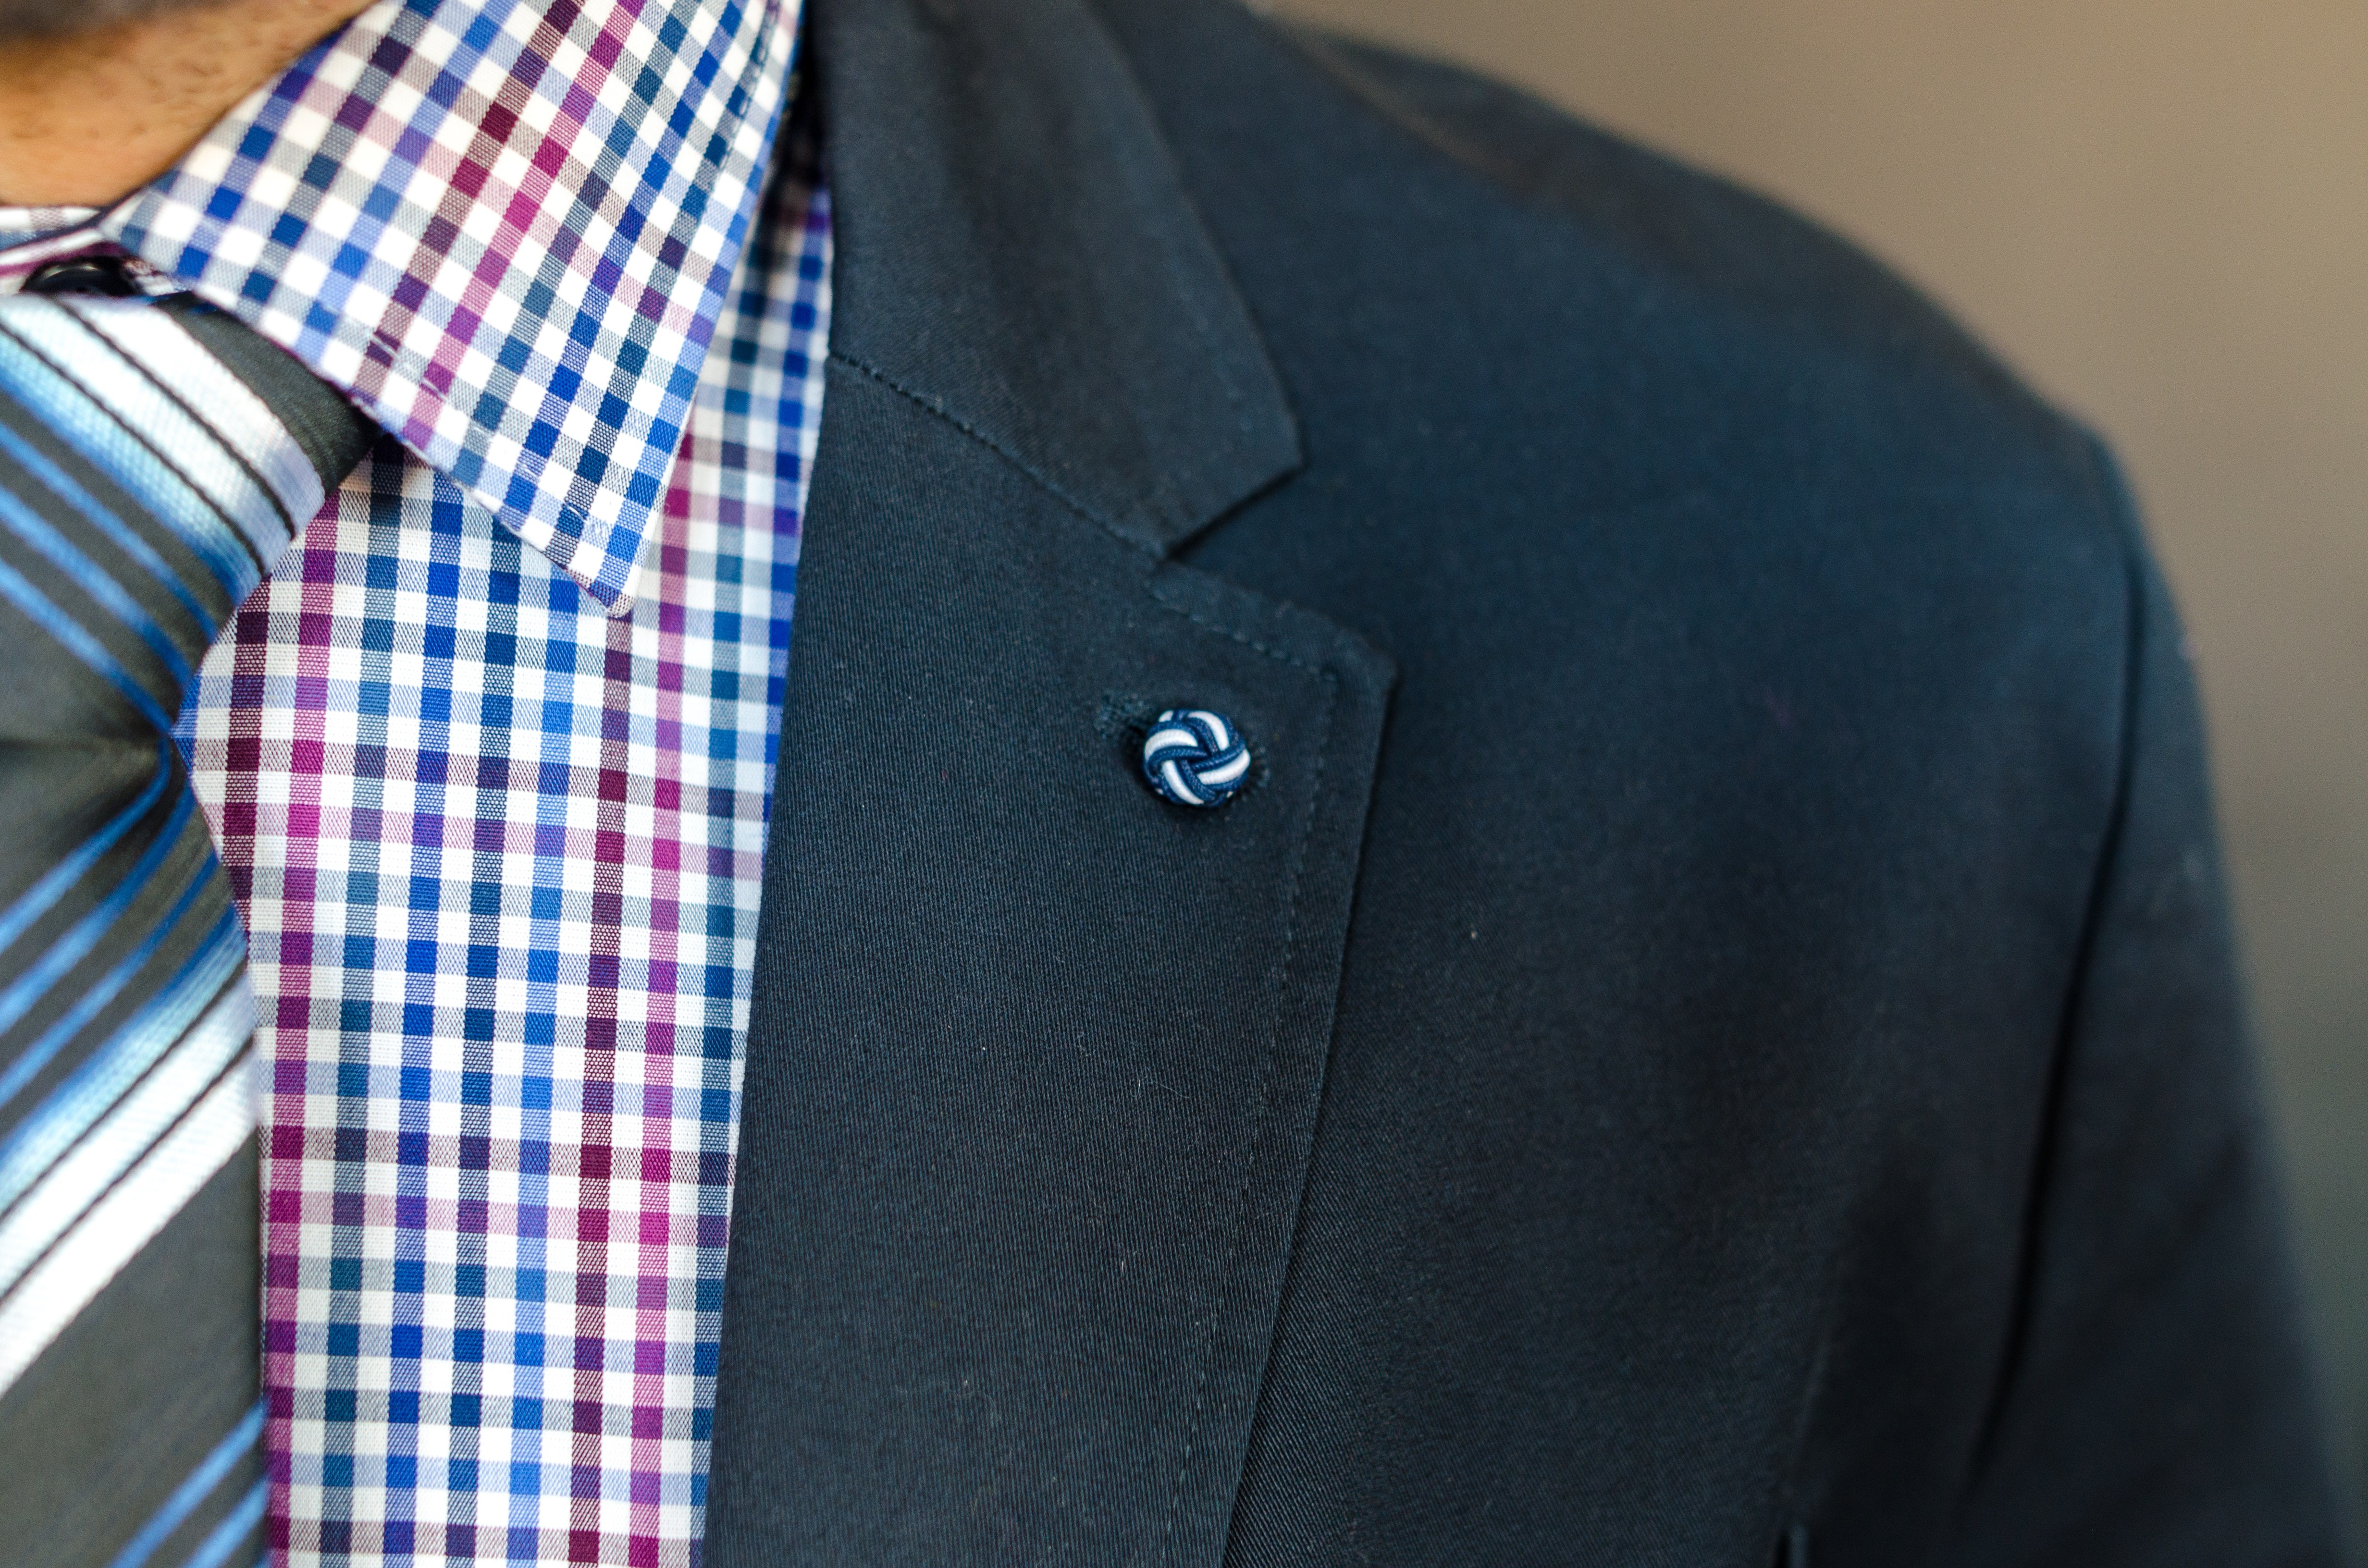 Imagem pessoal vestimenta (Foto: Pexels)